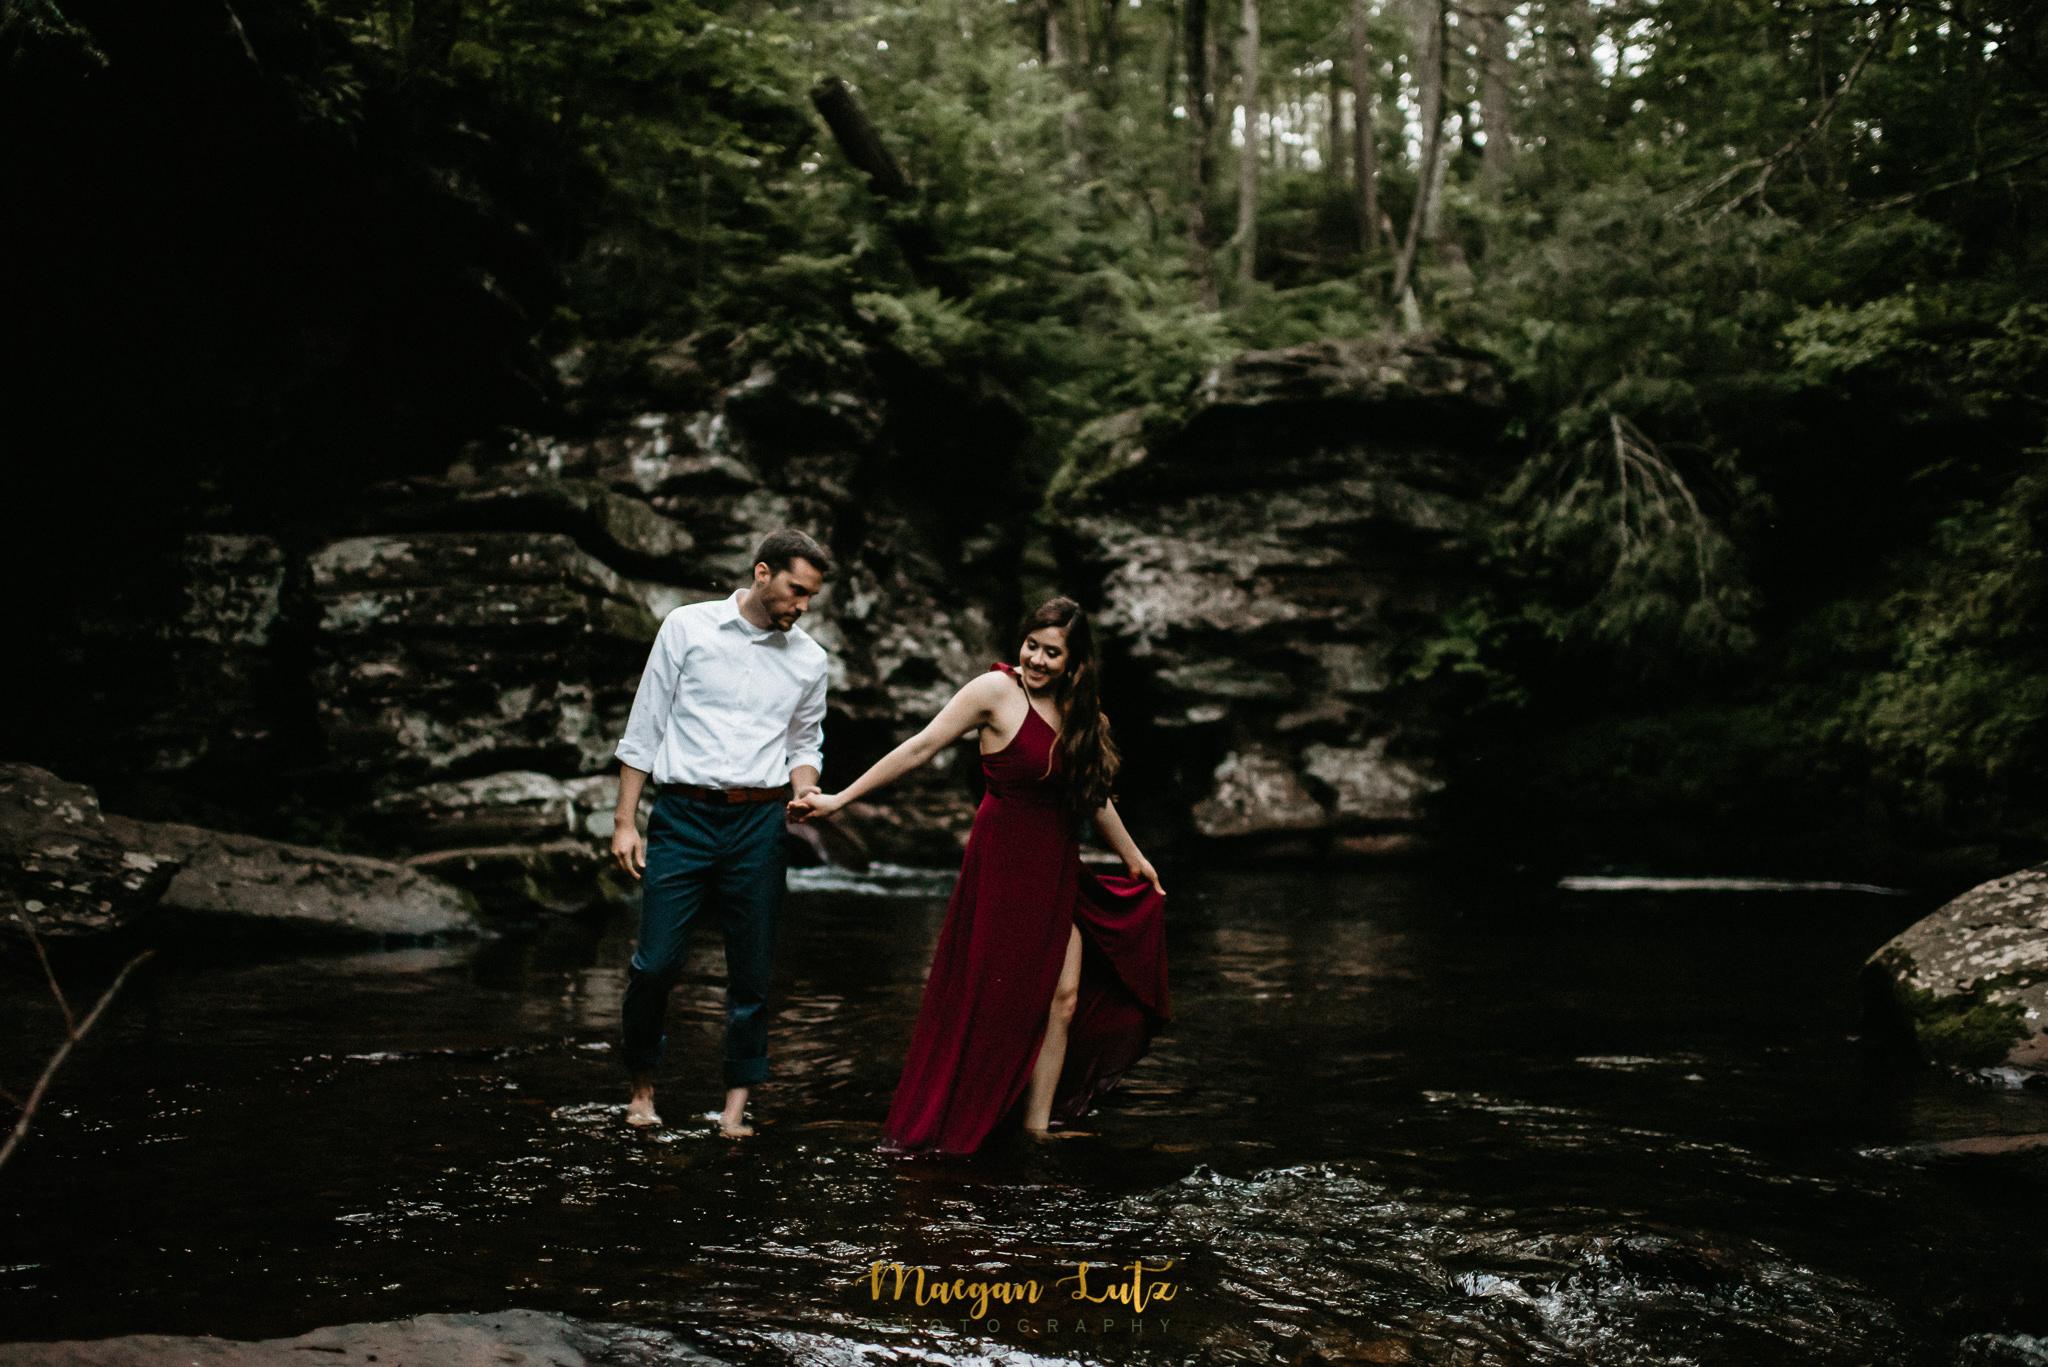 NEPA-Engagement-Wedding-Photographer-Session-at-Ricketts-Glen-State-Park-48.jpg